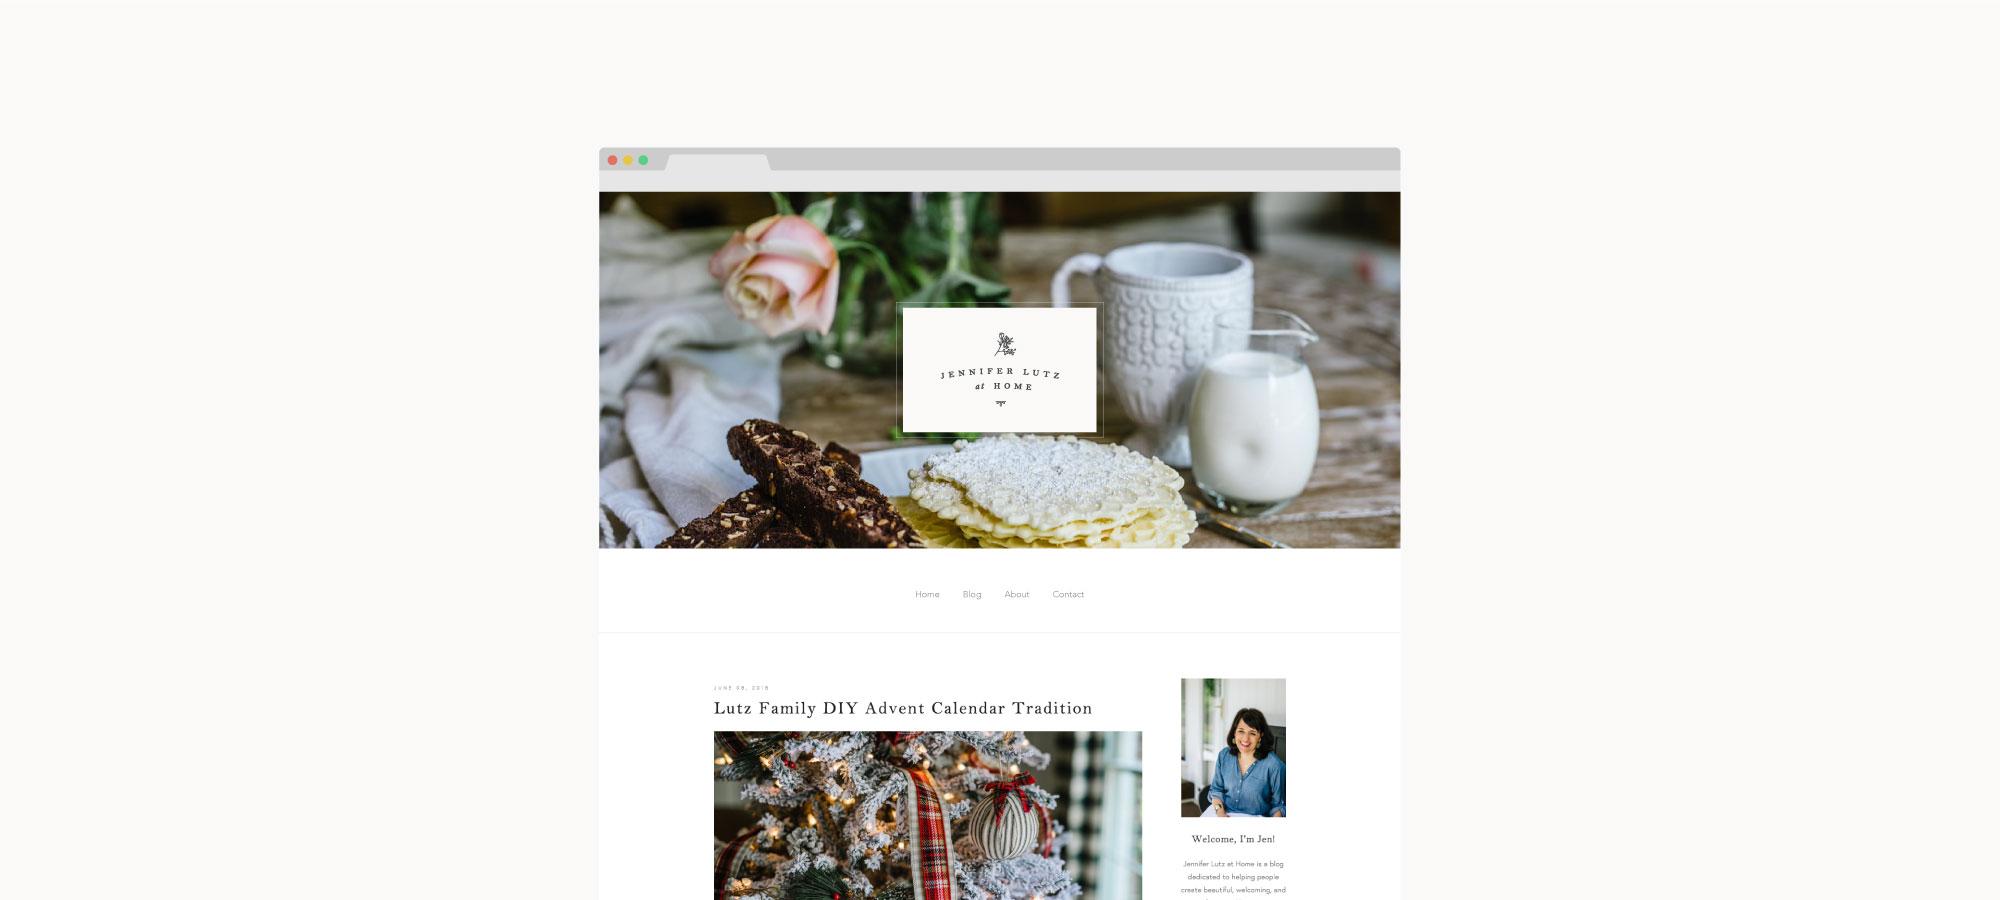 Jennifer Lutz at Home Custom Brand and Web Design by Viola Hill Studio